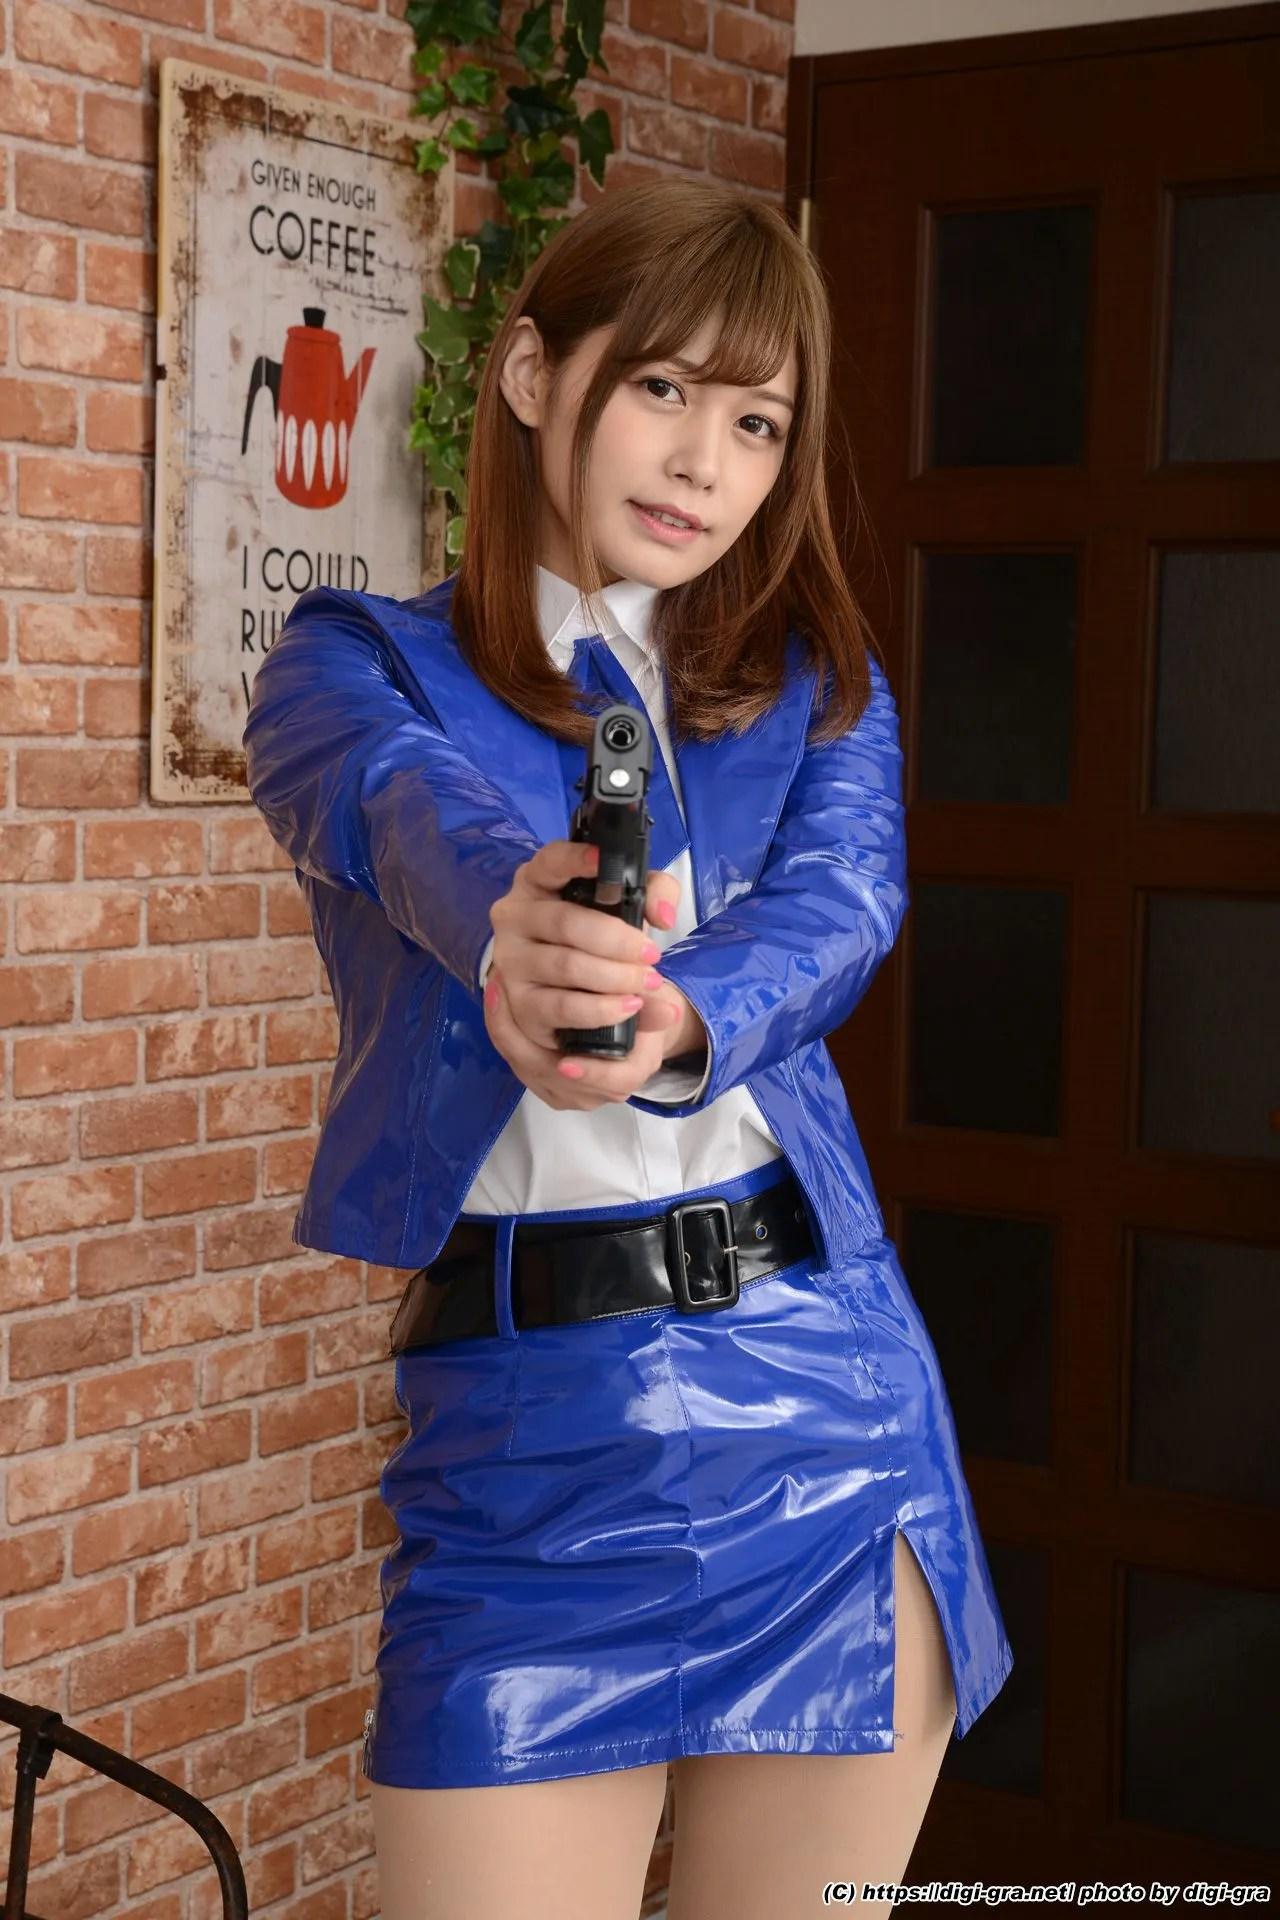 [Digi-Gra] Hikaru Konno 绀野ひかる Photoset 07 写真集[74P]插图(4)